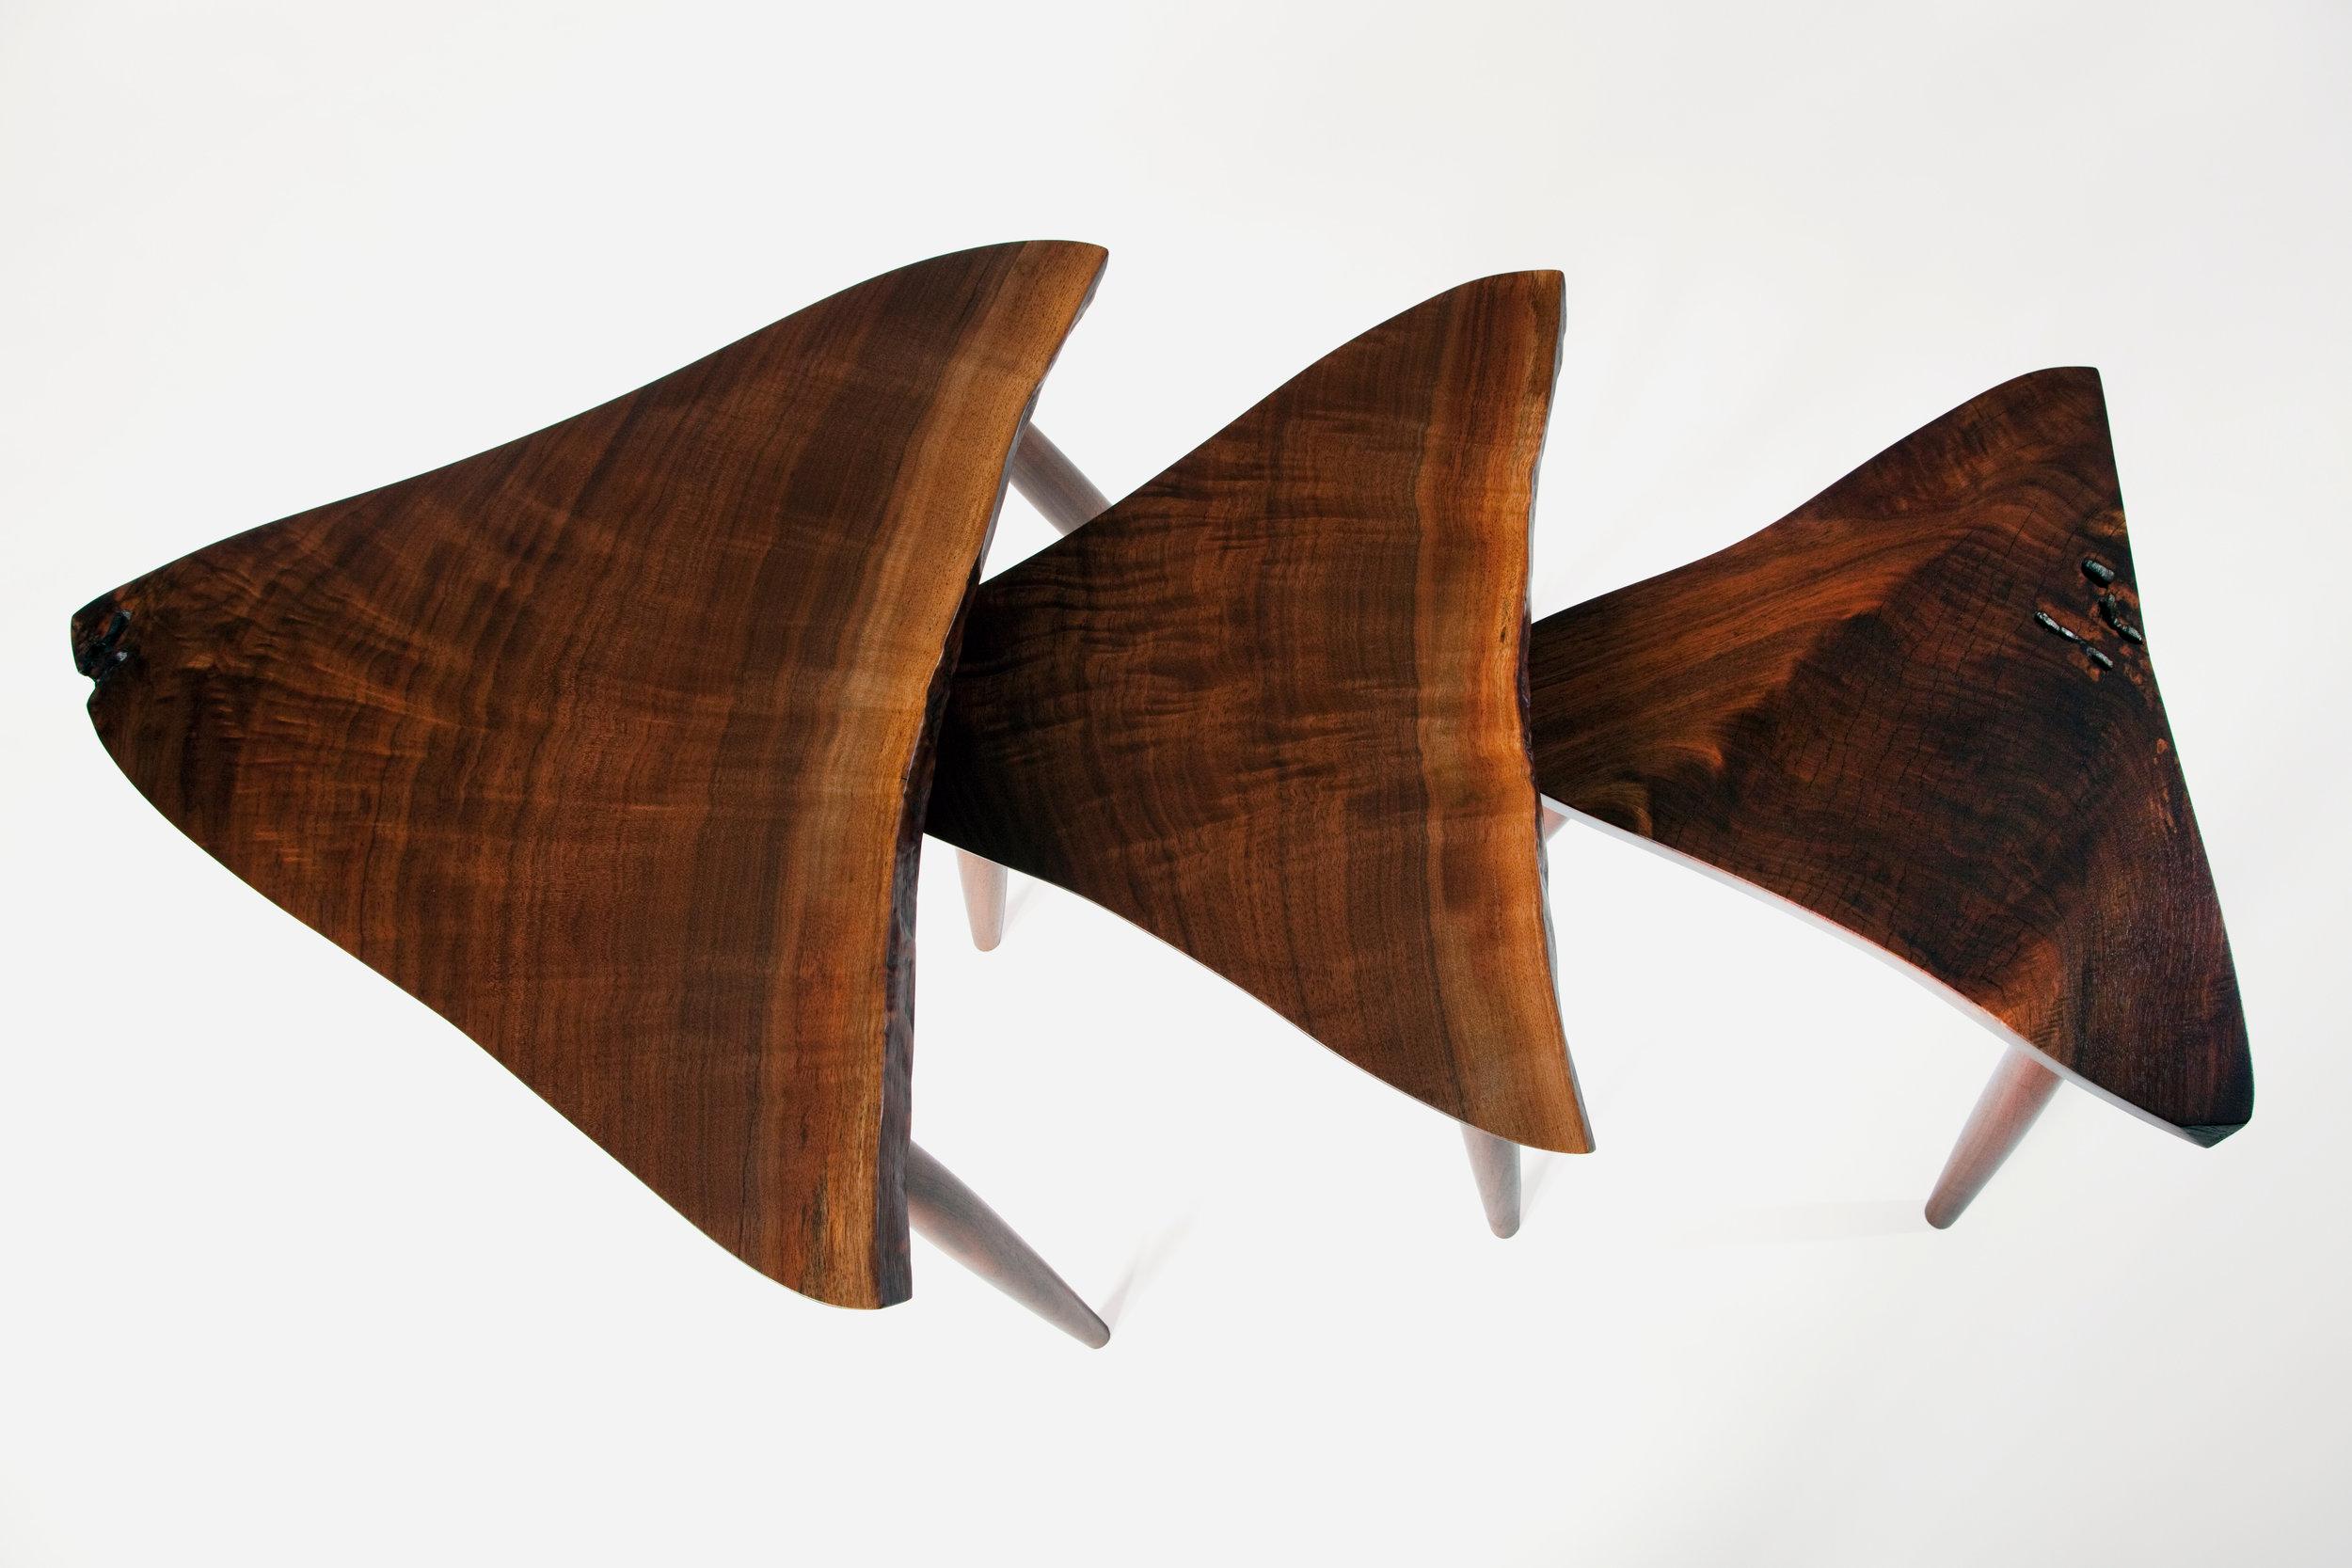 Mira Nakashima's Amoeba Tables